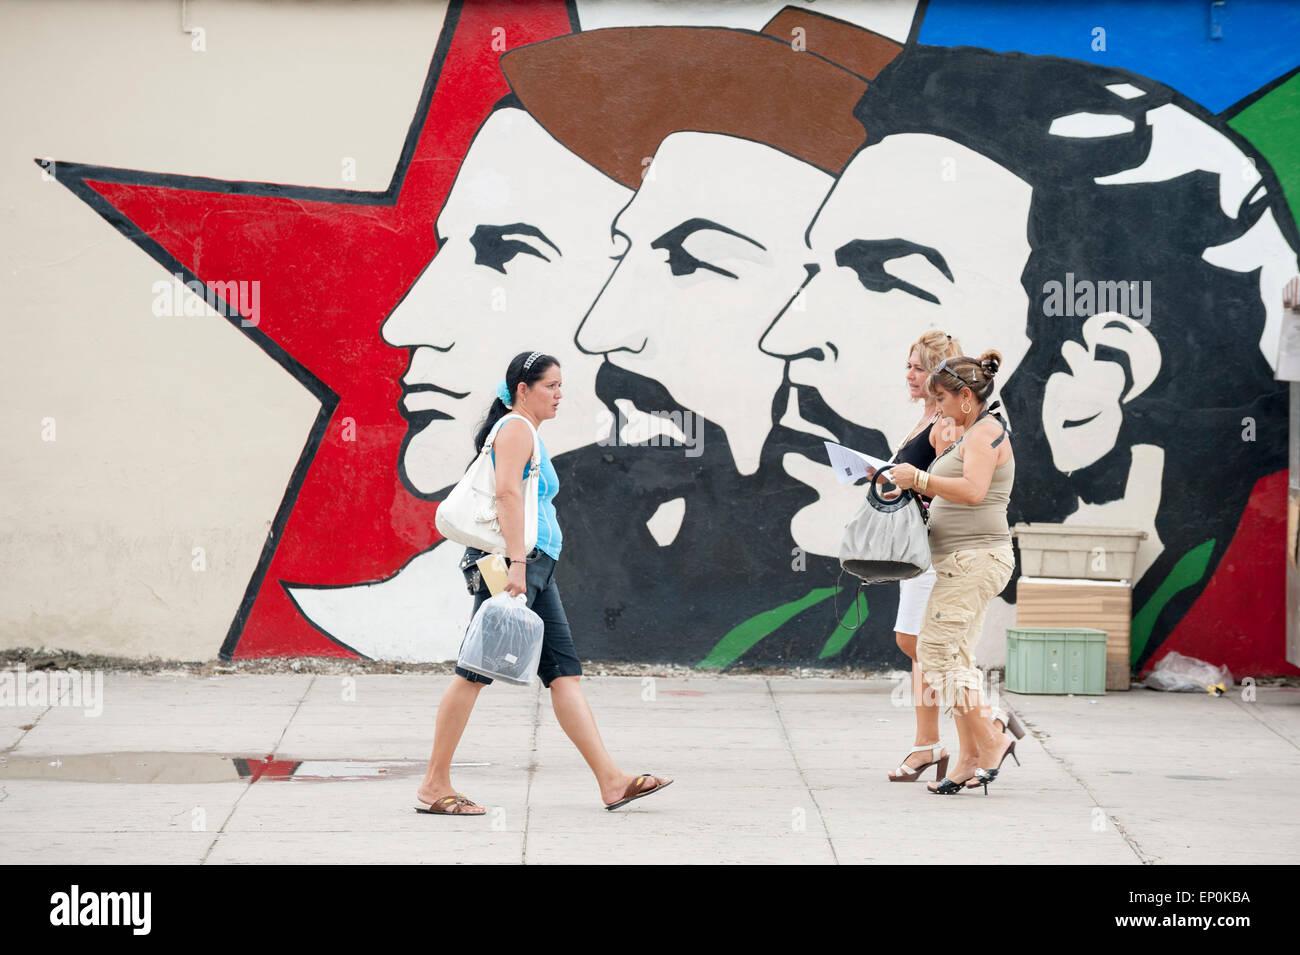 HAVANA, CUBA - JUNE 13, 2011: Cuban pedestirans walk in front of propaganda mural featuring three leaders of the - Stock Image